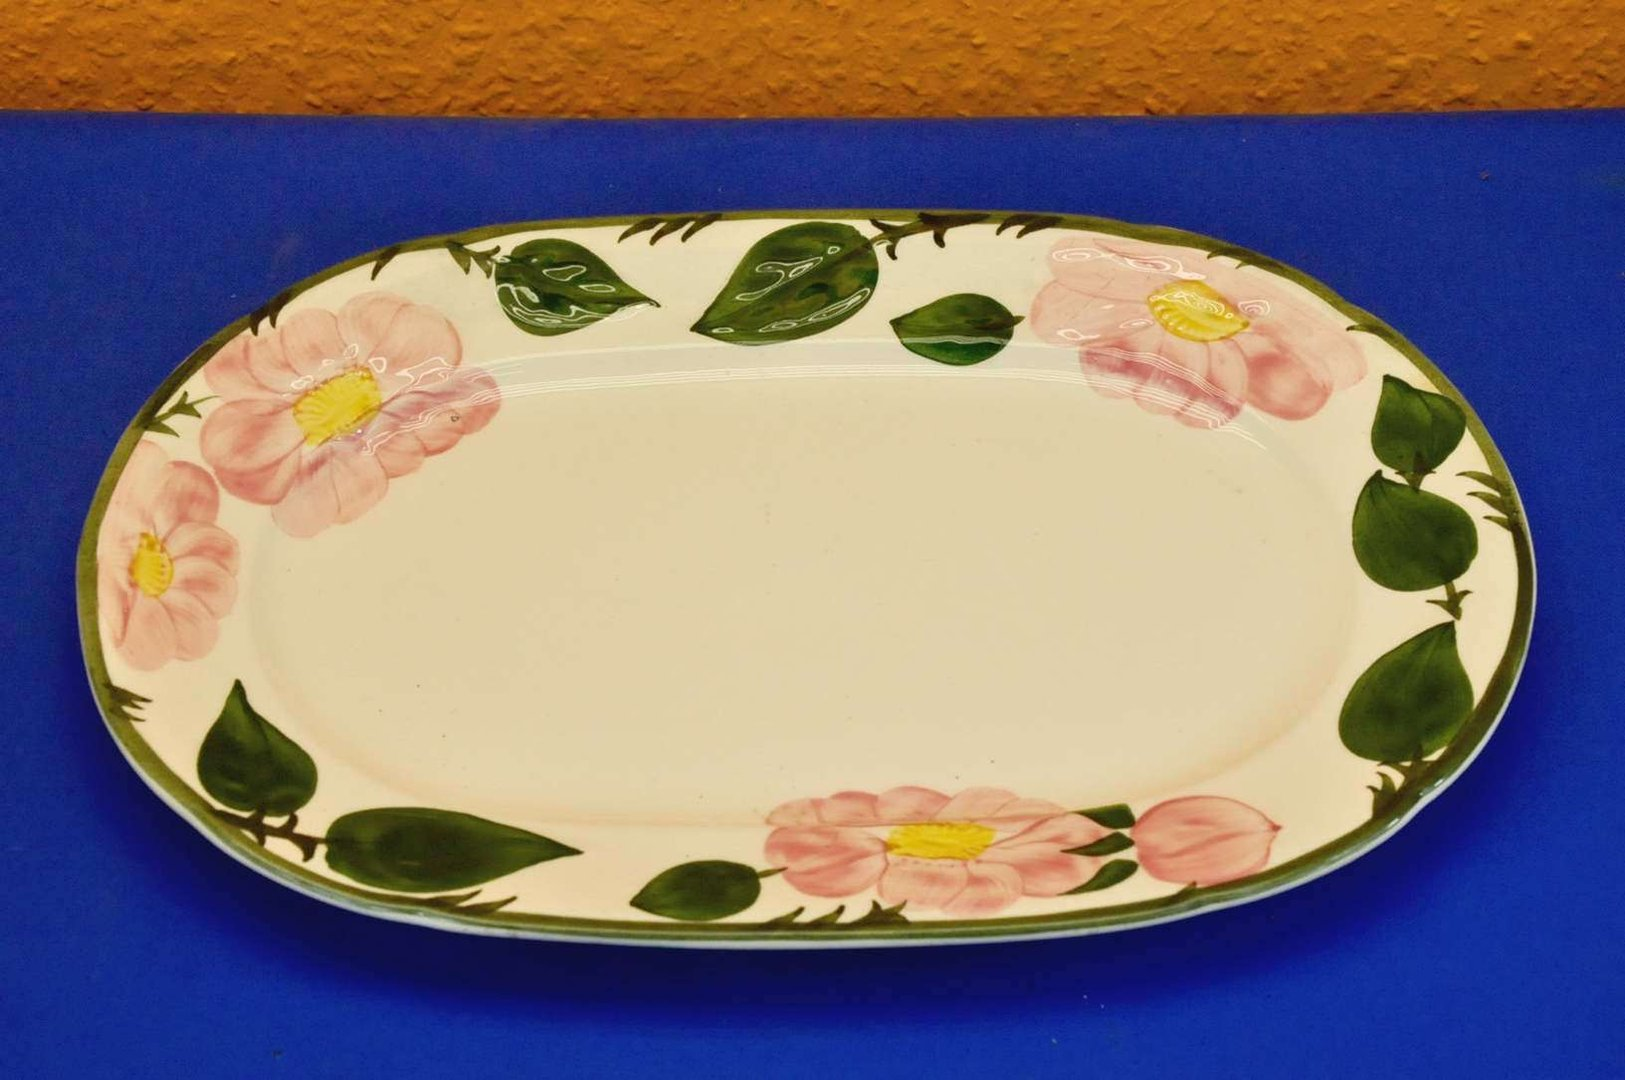 Villeroy boch wild rose porcelain plate oval kusera - Villeroy and boch ...